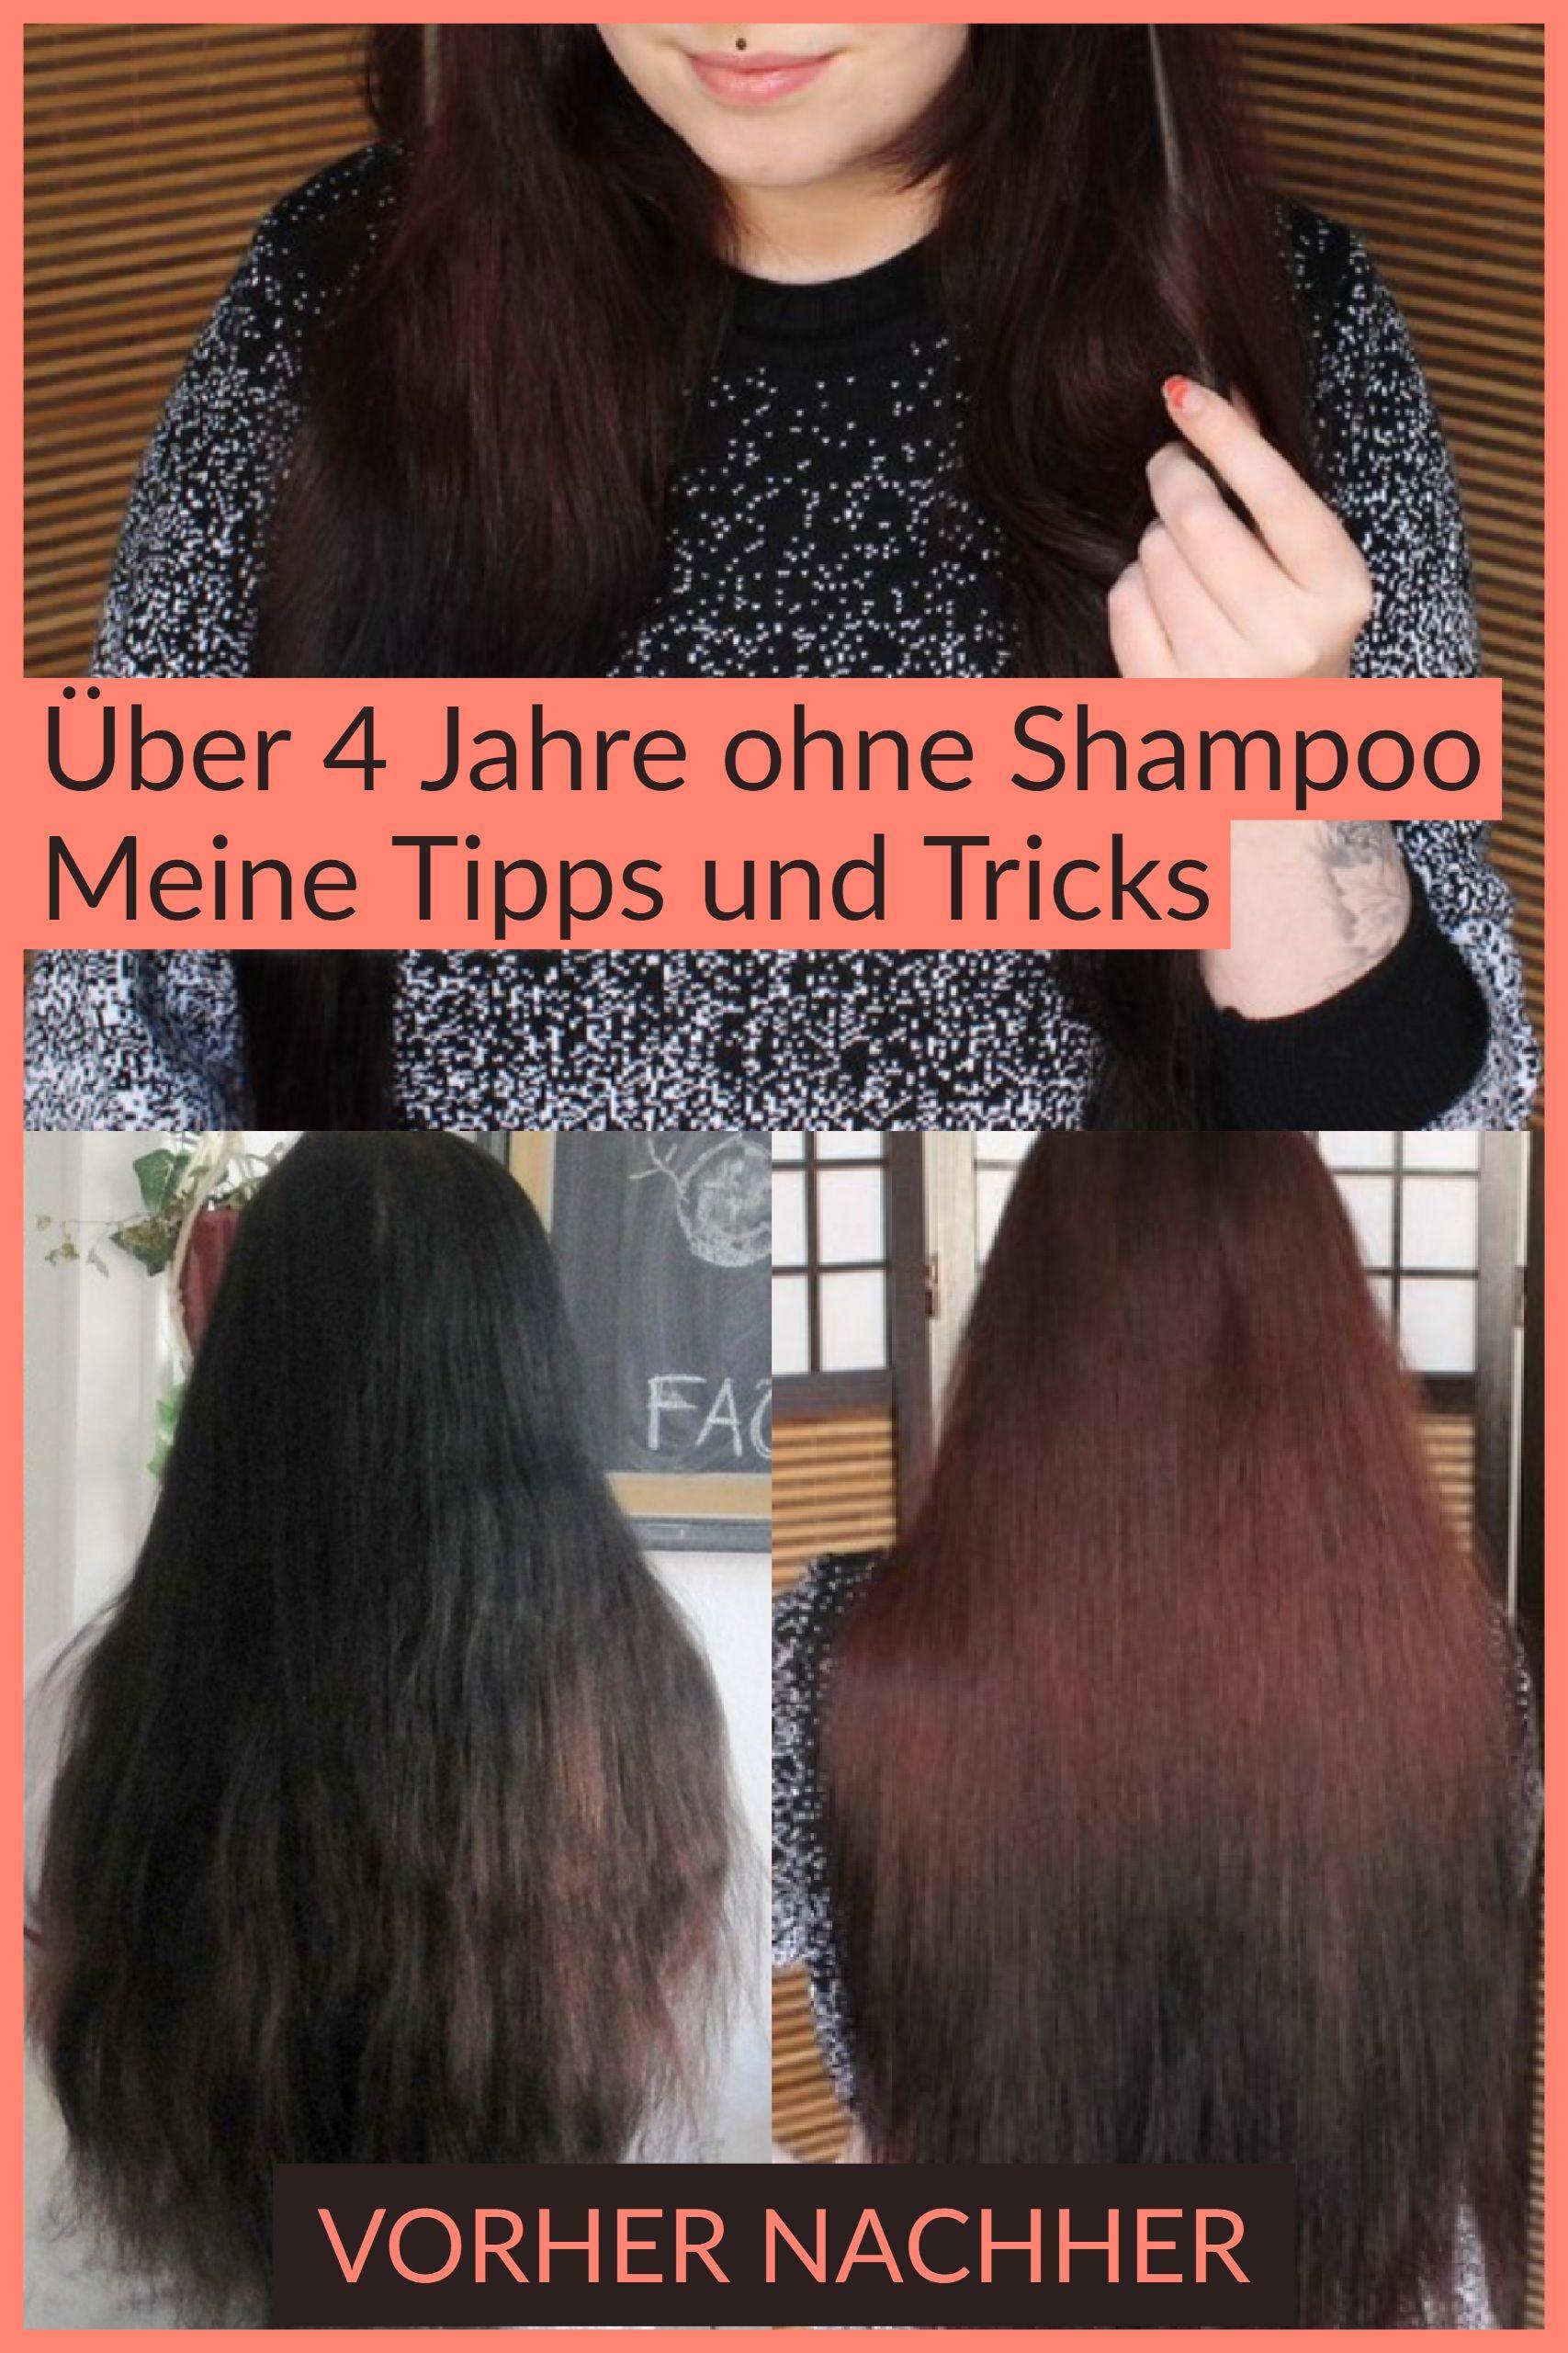 Nopoo Poofree Shampoo Haarpflege Haarewaschen Vegan Natural Naturkosmetik Organic Veganbeauty Veganhairc Shampoo Haare Pflegen Shampoo Selber Machen